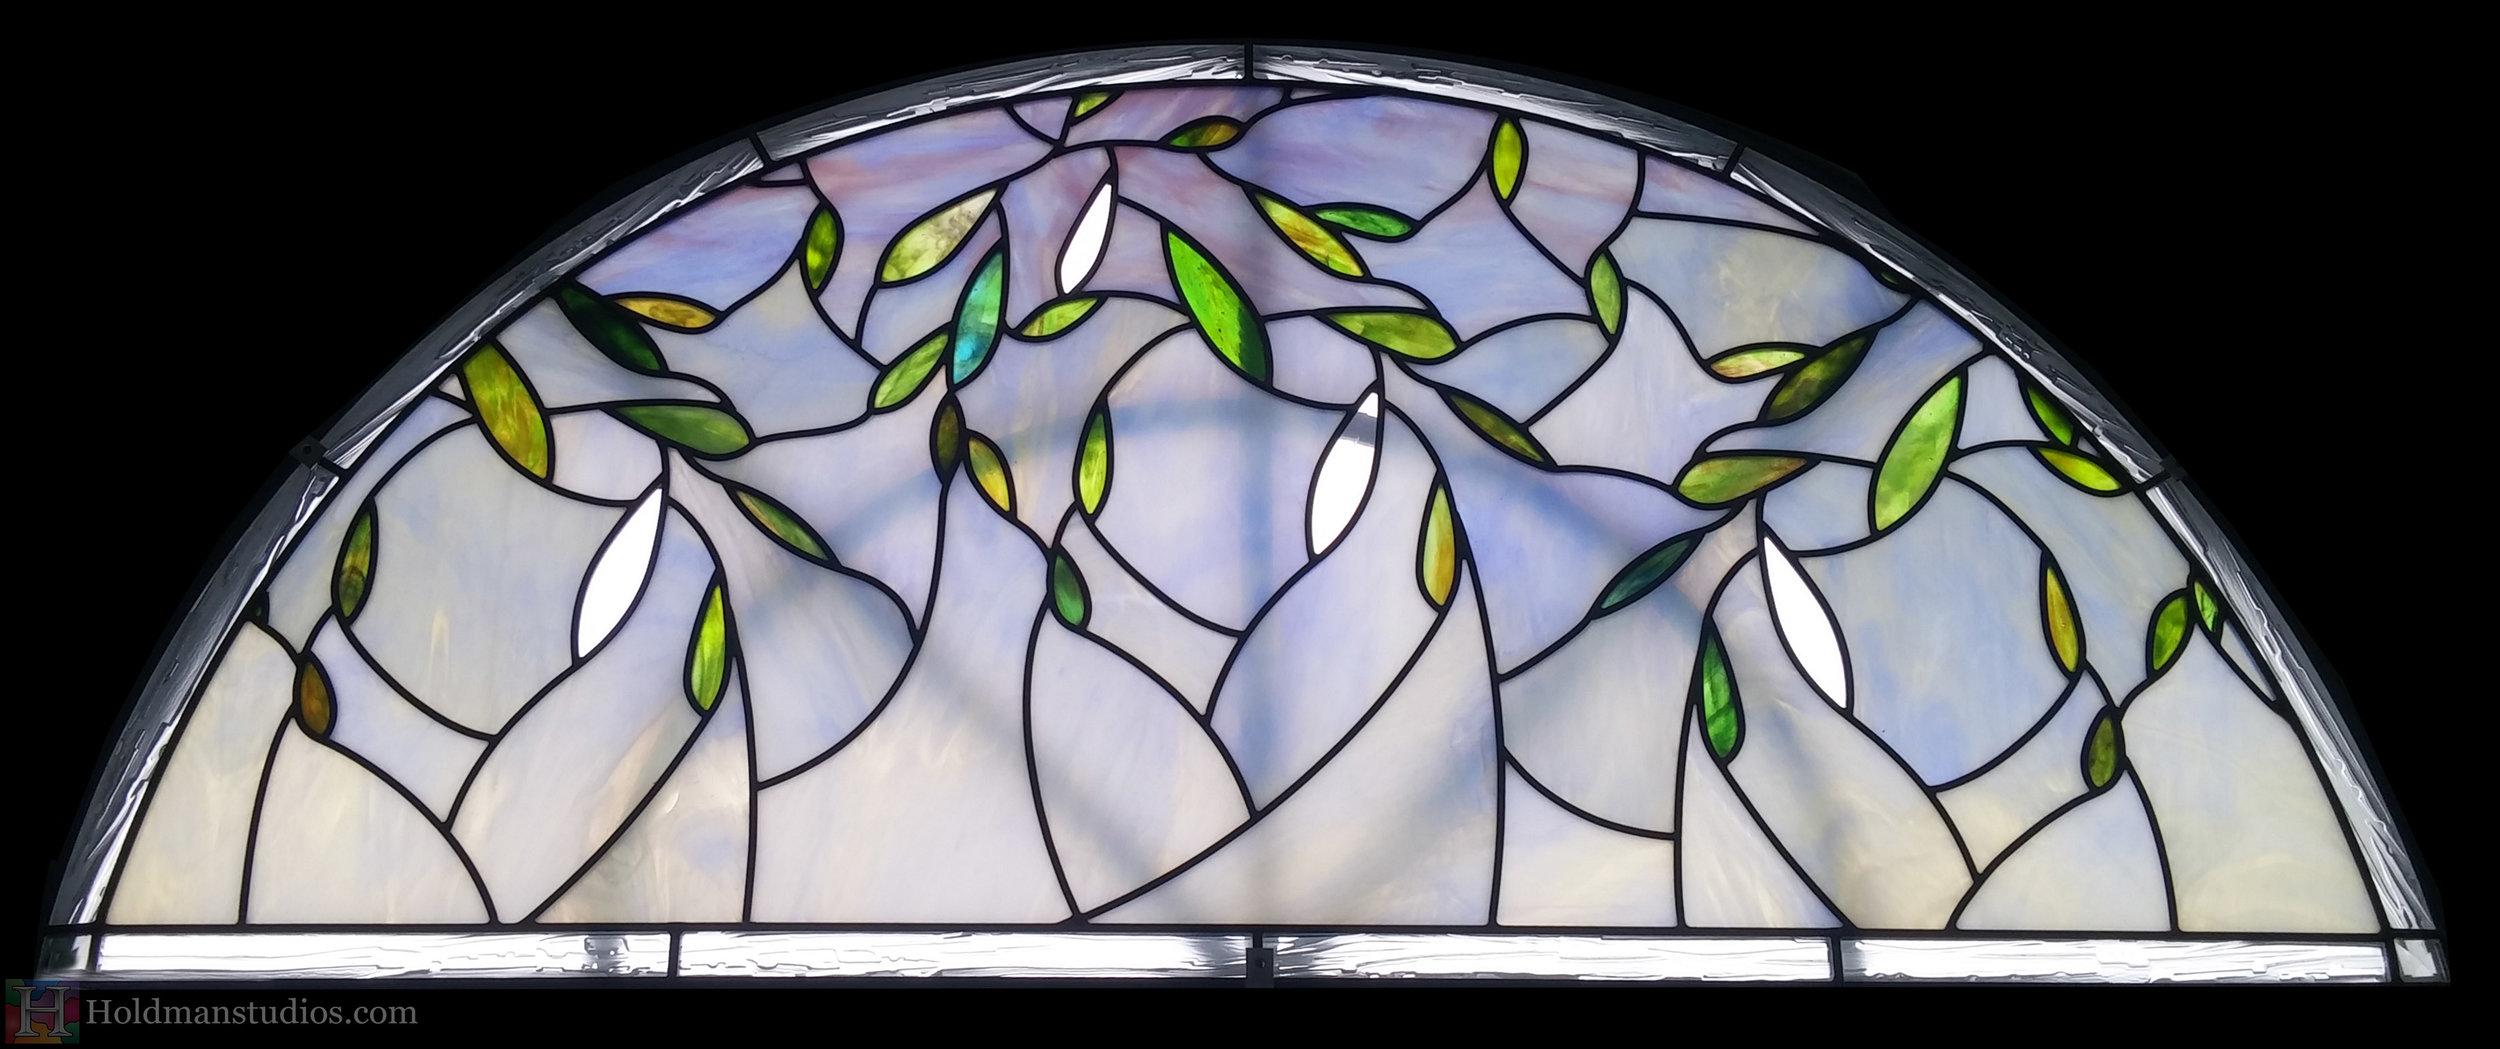 holdman-studios-stained-textured-glass-lunette-window-olive-leaves.jpg